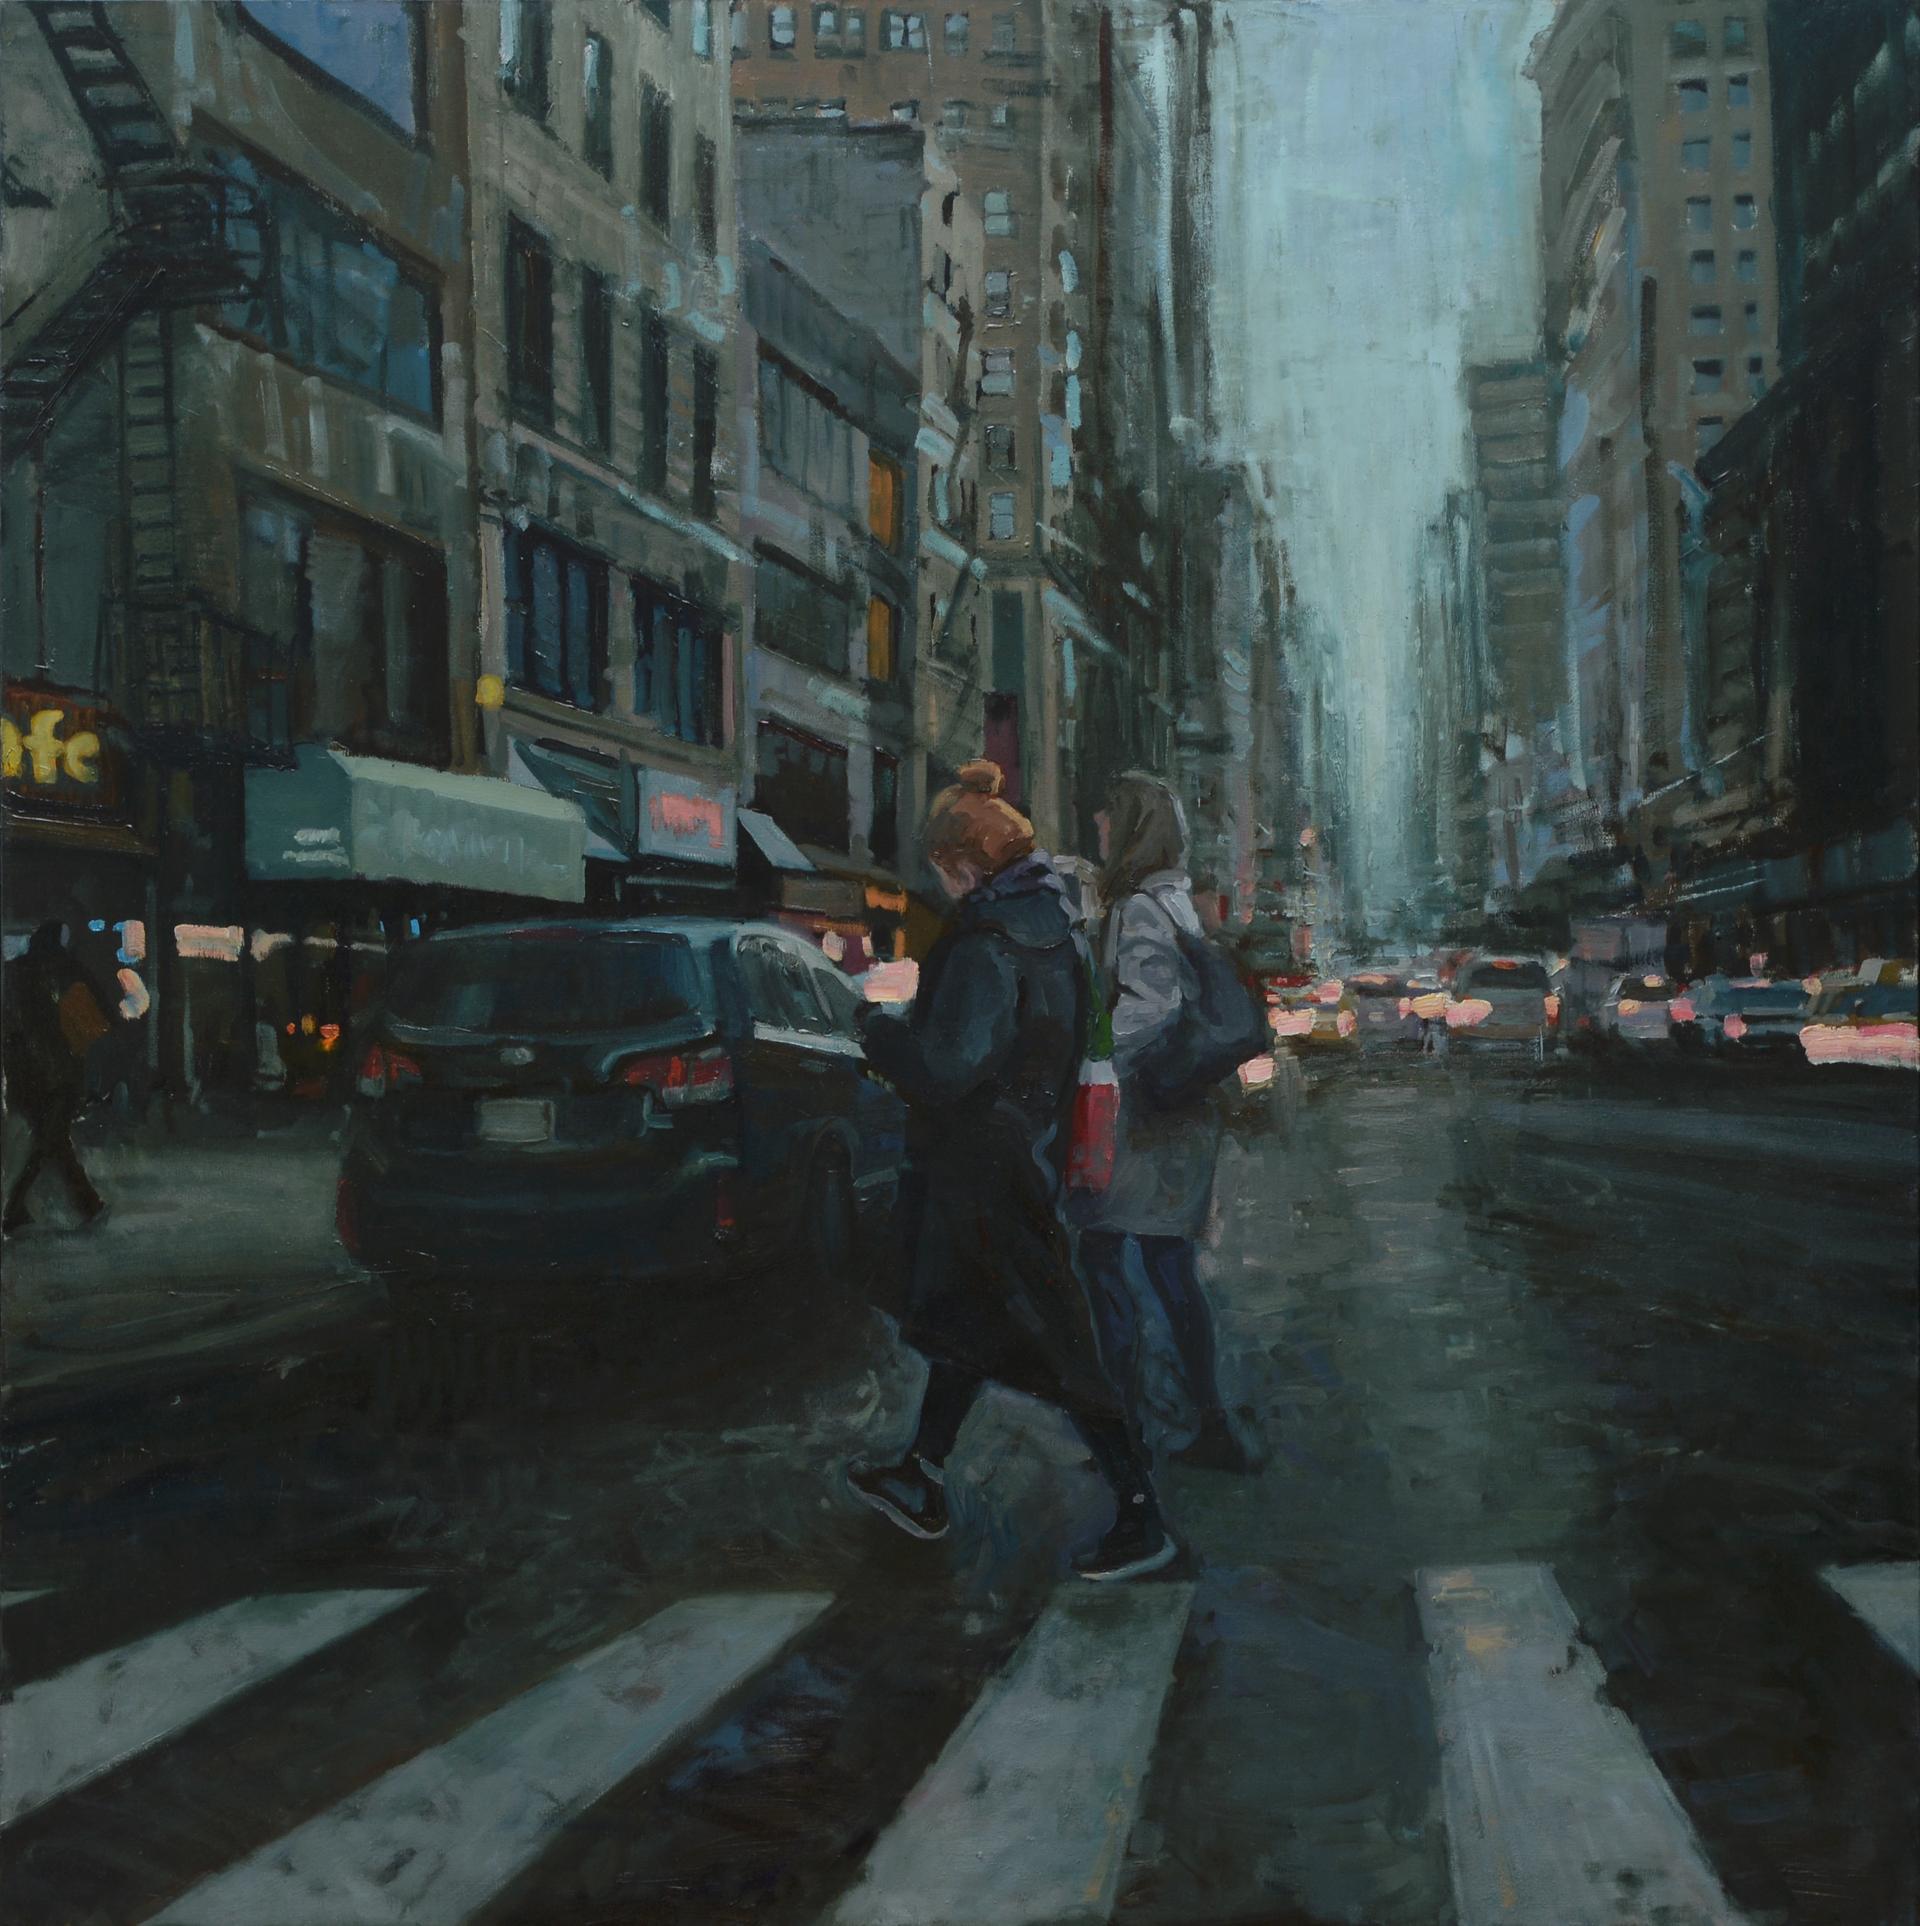 Walker by Jim Beckner